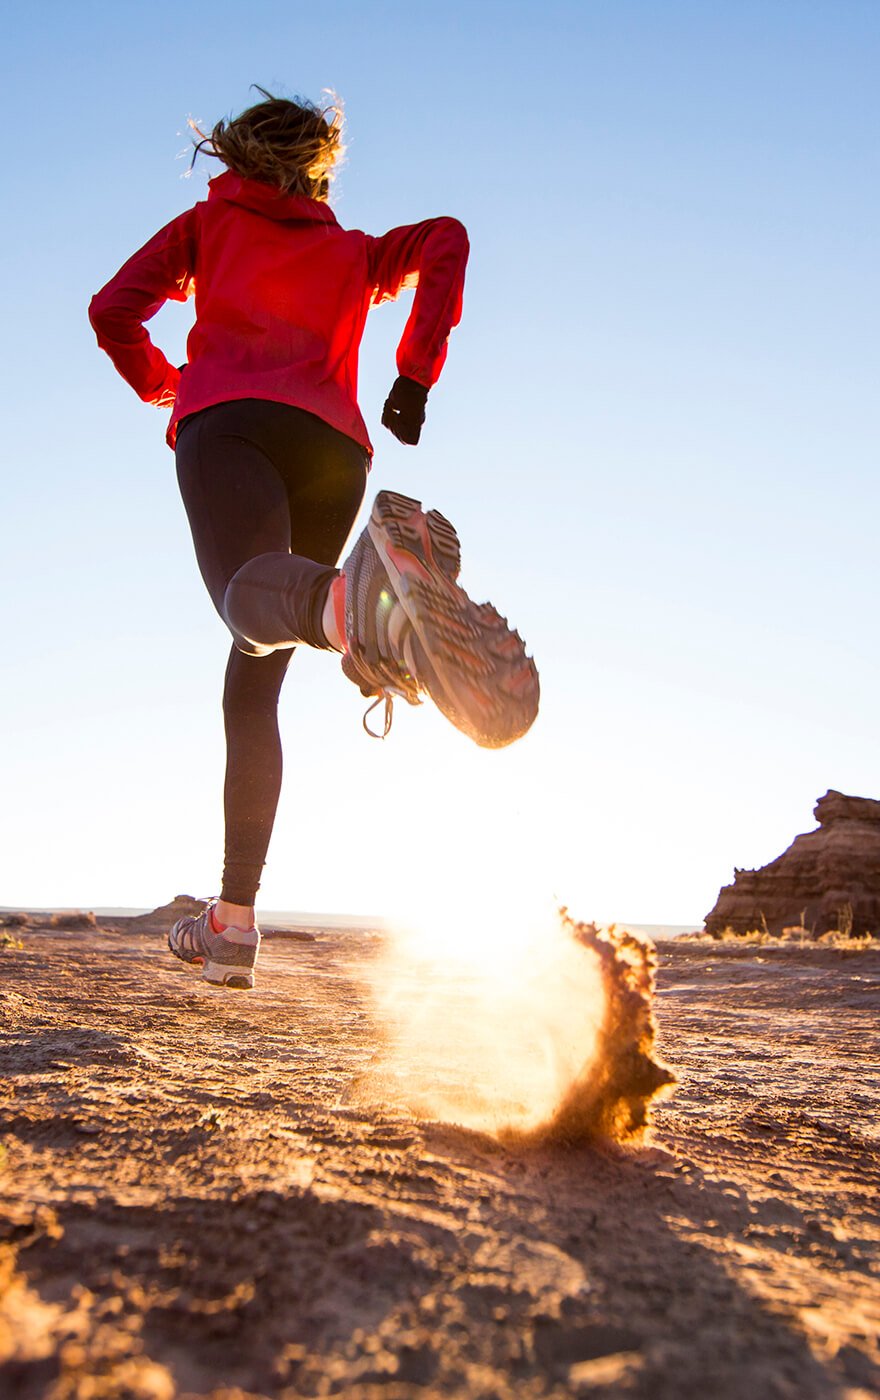 How can I prevent runner's diarrhea?